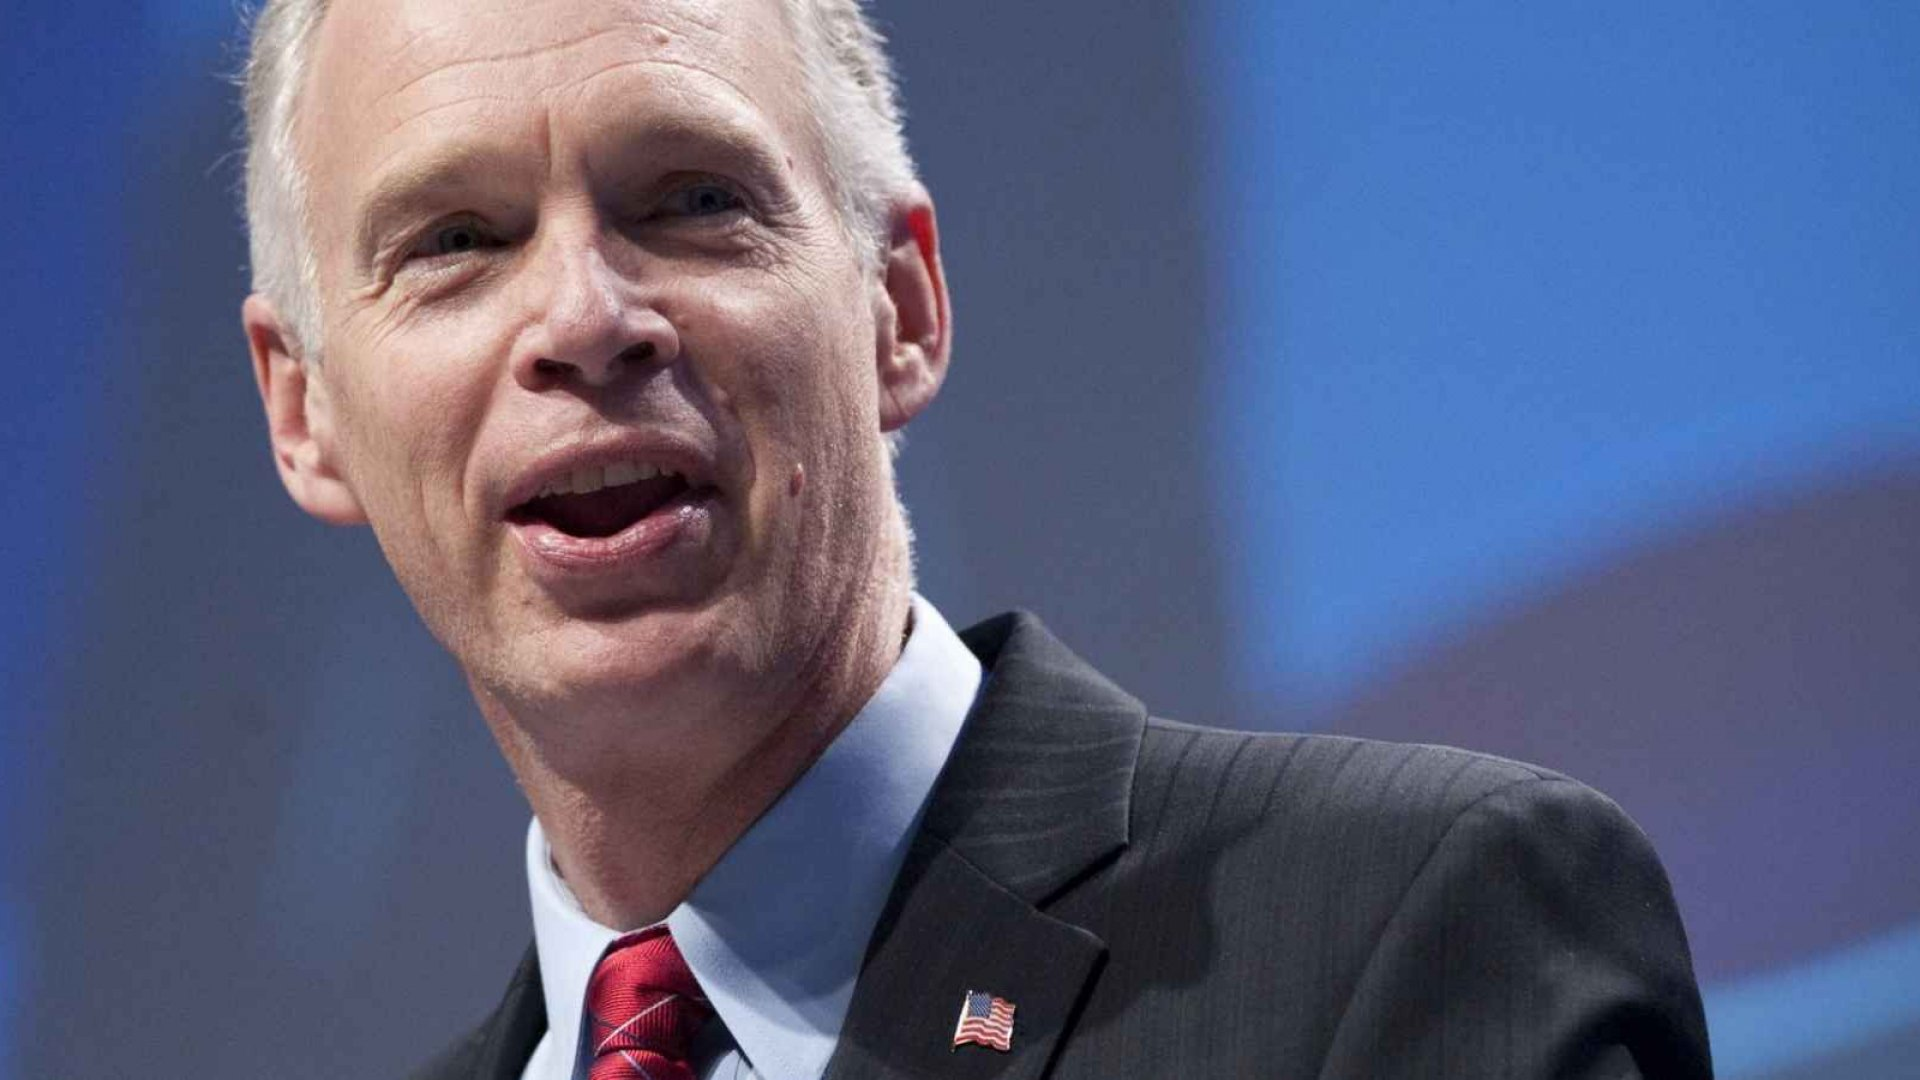 Senator Ron Johnson (R, Wisconsin) addressed a panel on immigration in Washington Tuesday.